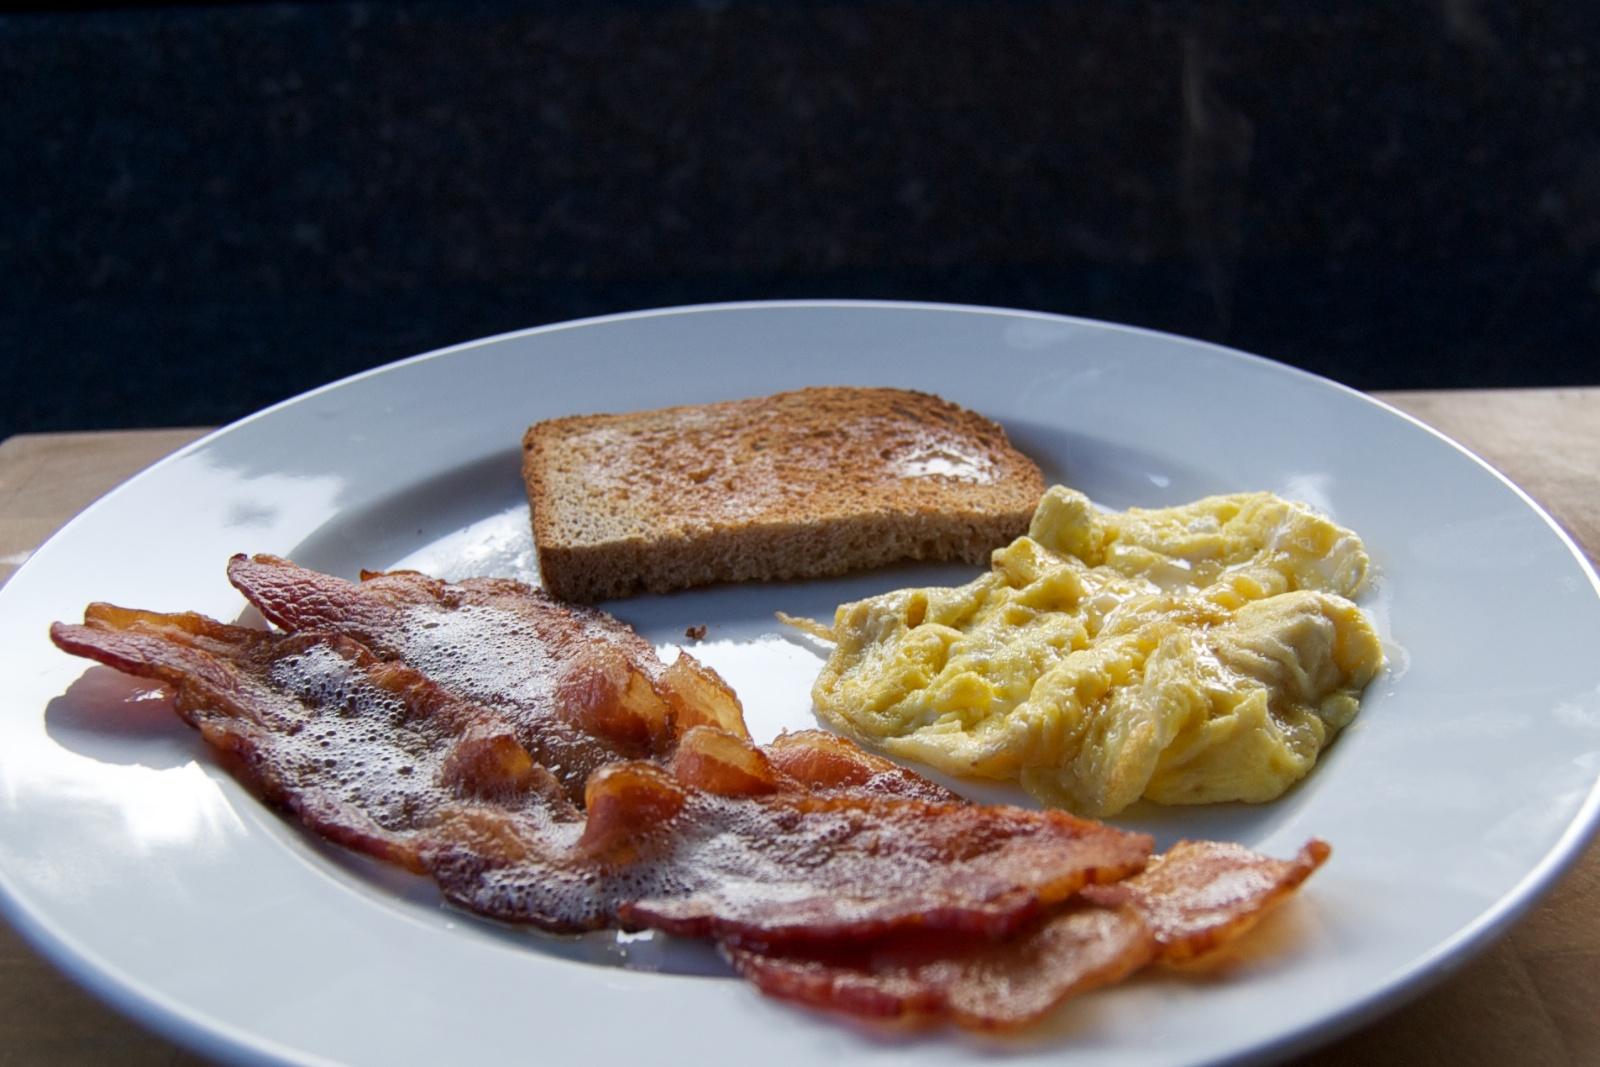 http://blog.rickk.com/food/2012/08/20/ate.2012.08.20.b.jpg